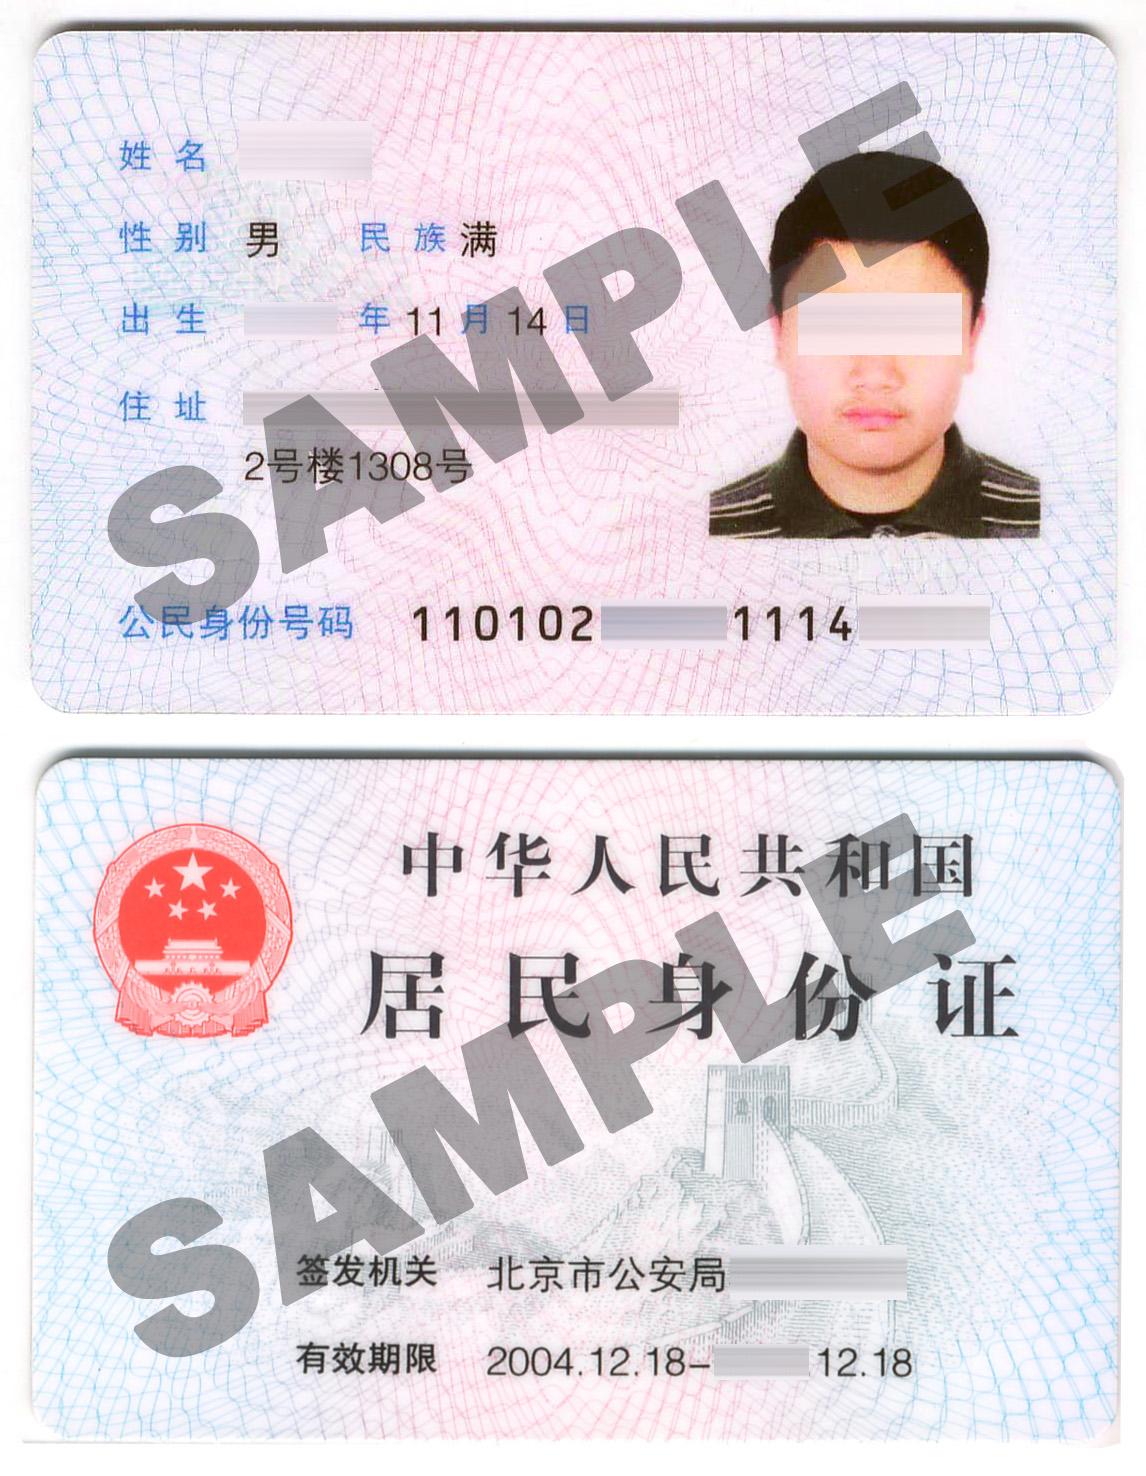 Resident Identity Card Wikipedia